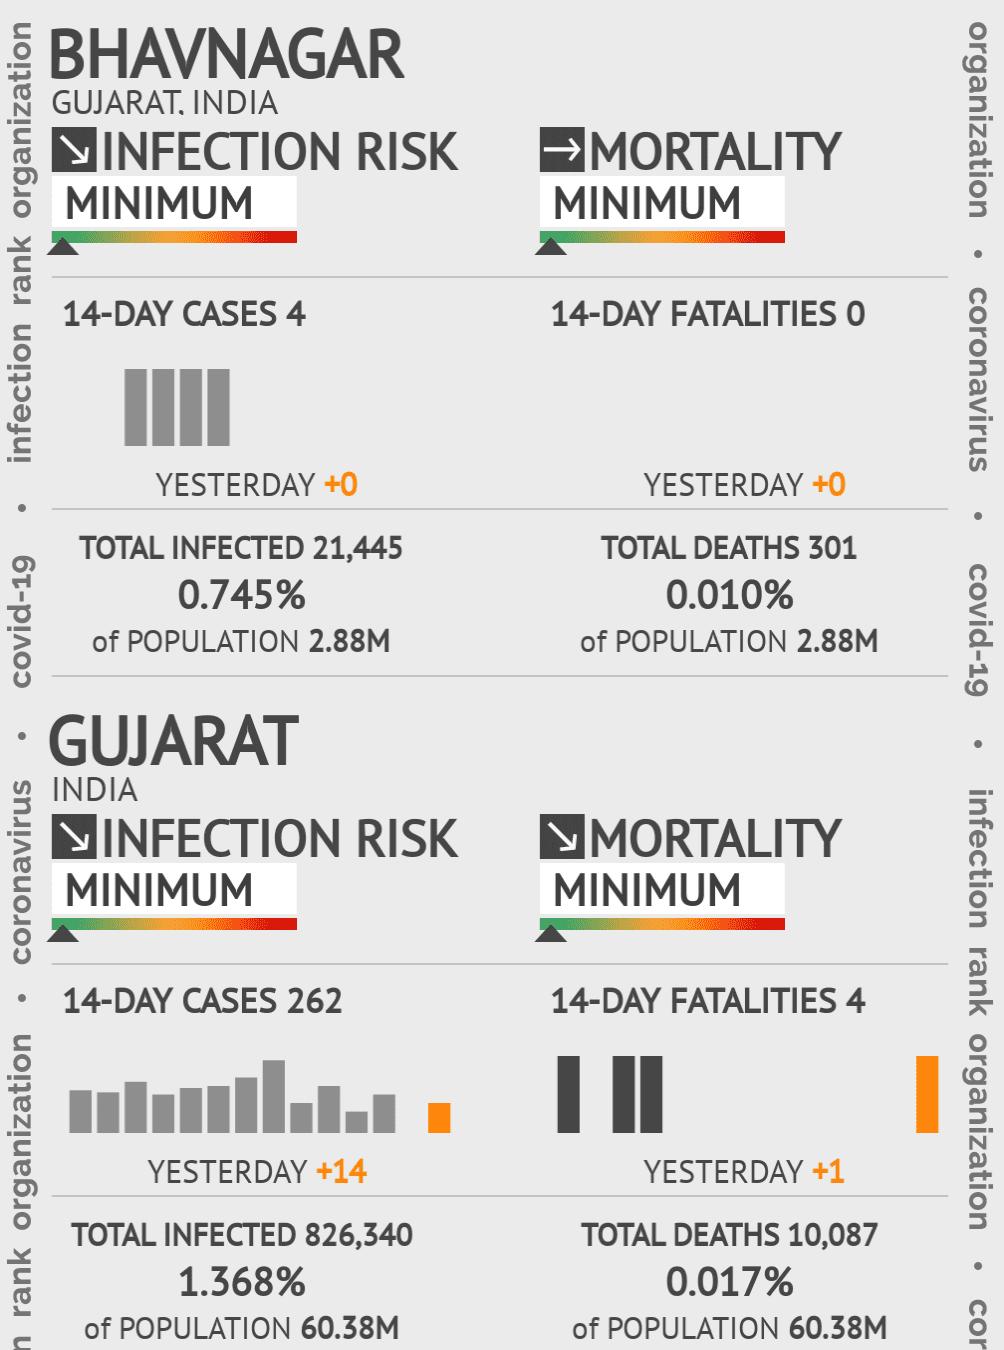 Bhavnagar Coronavirus Covid-19 Risk of Infection on March 04, 2021